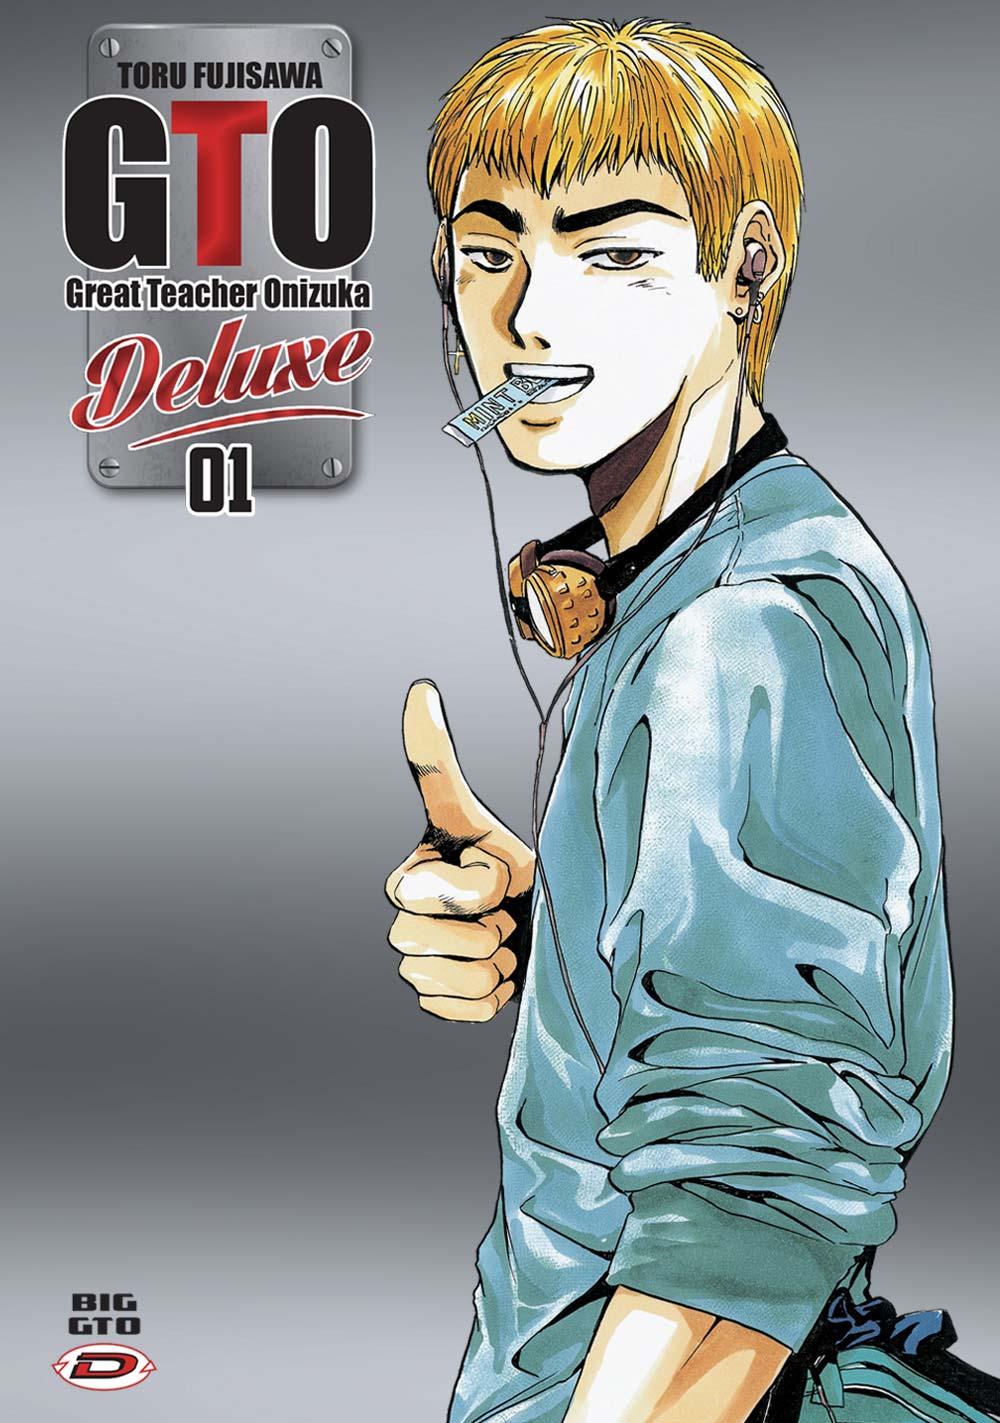 BIG  G.T.O. - GREAT TEACHER ONIZUKA - GTO DELUXE  N.   1